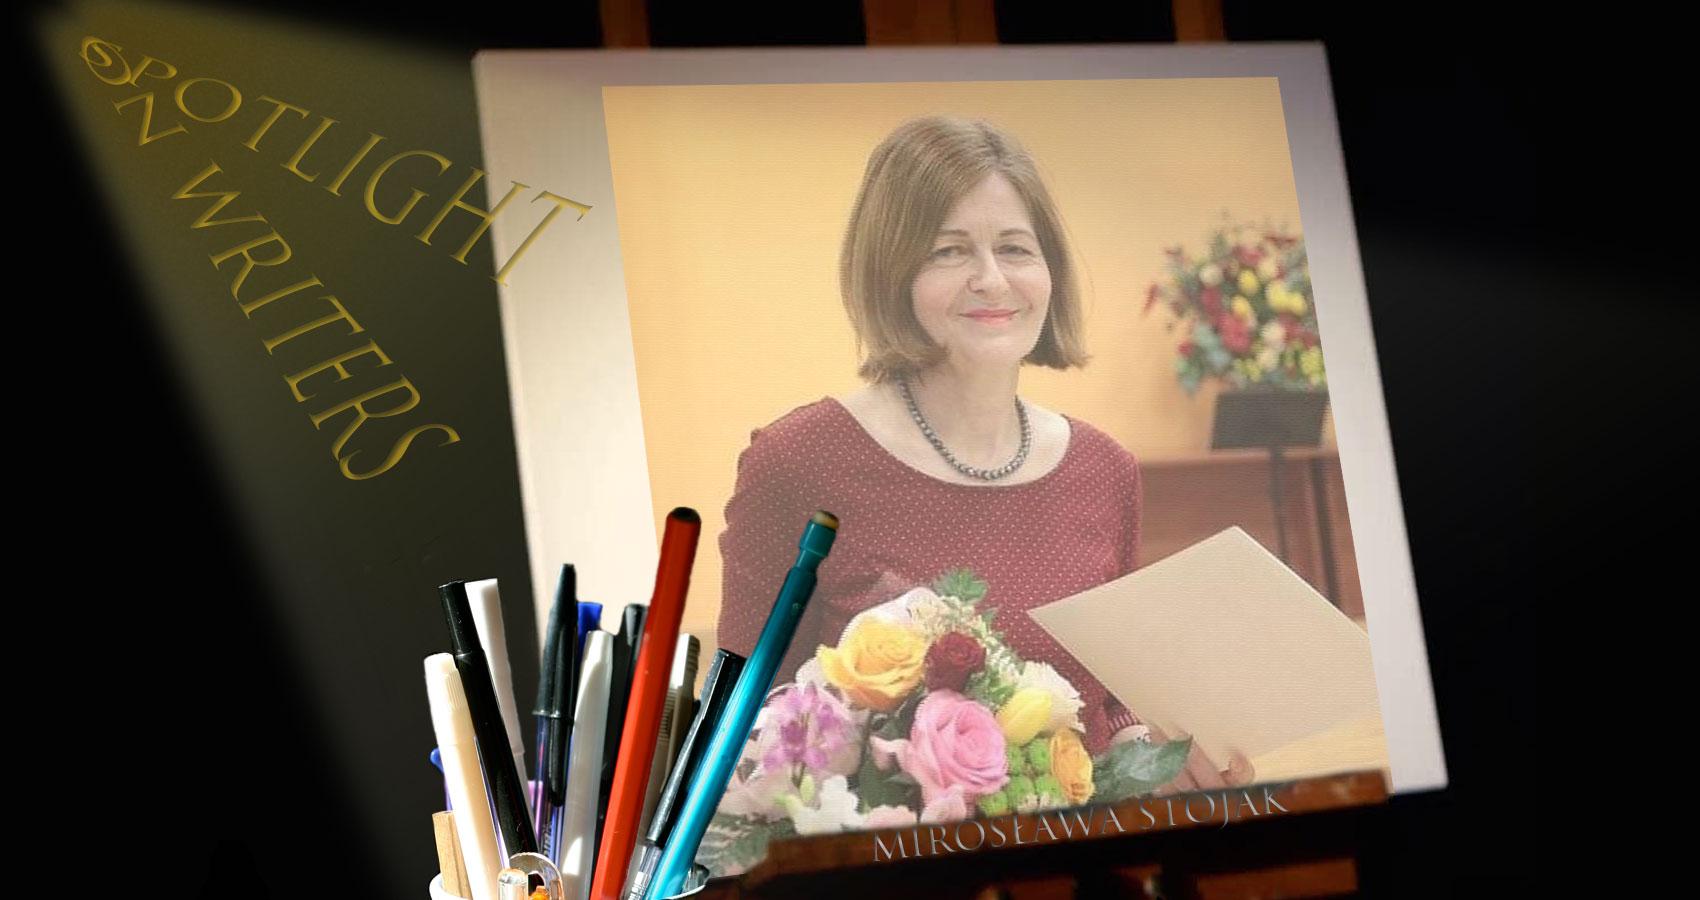 Spotlight On Writers - Mirosława Stojak, an interview at Spillwords.com